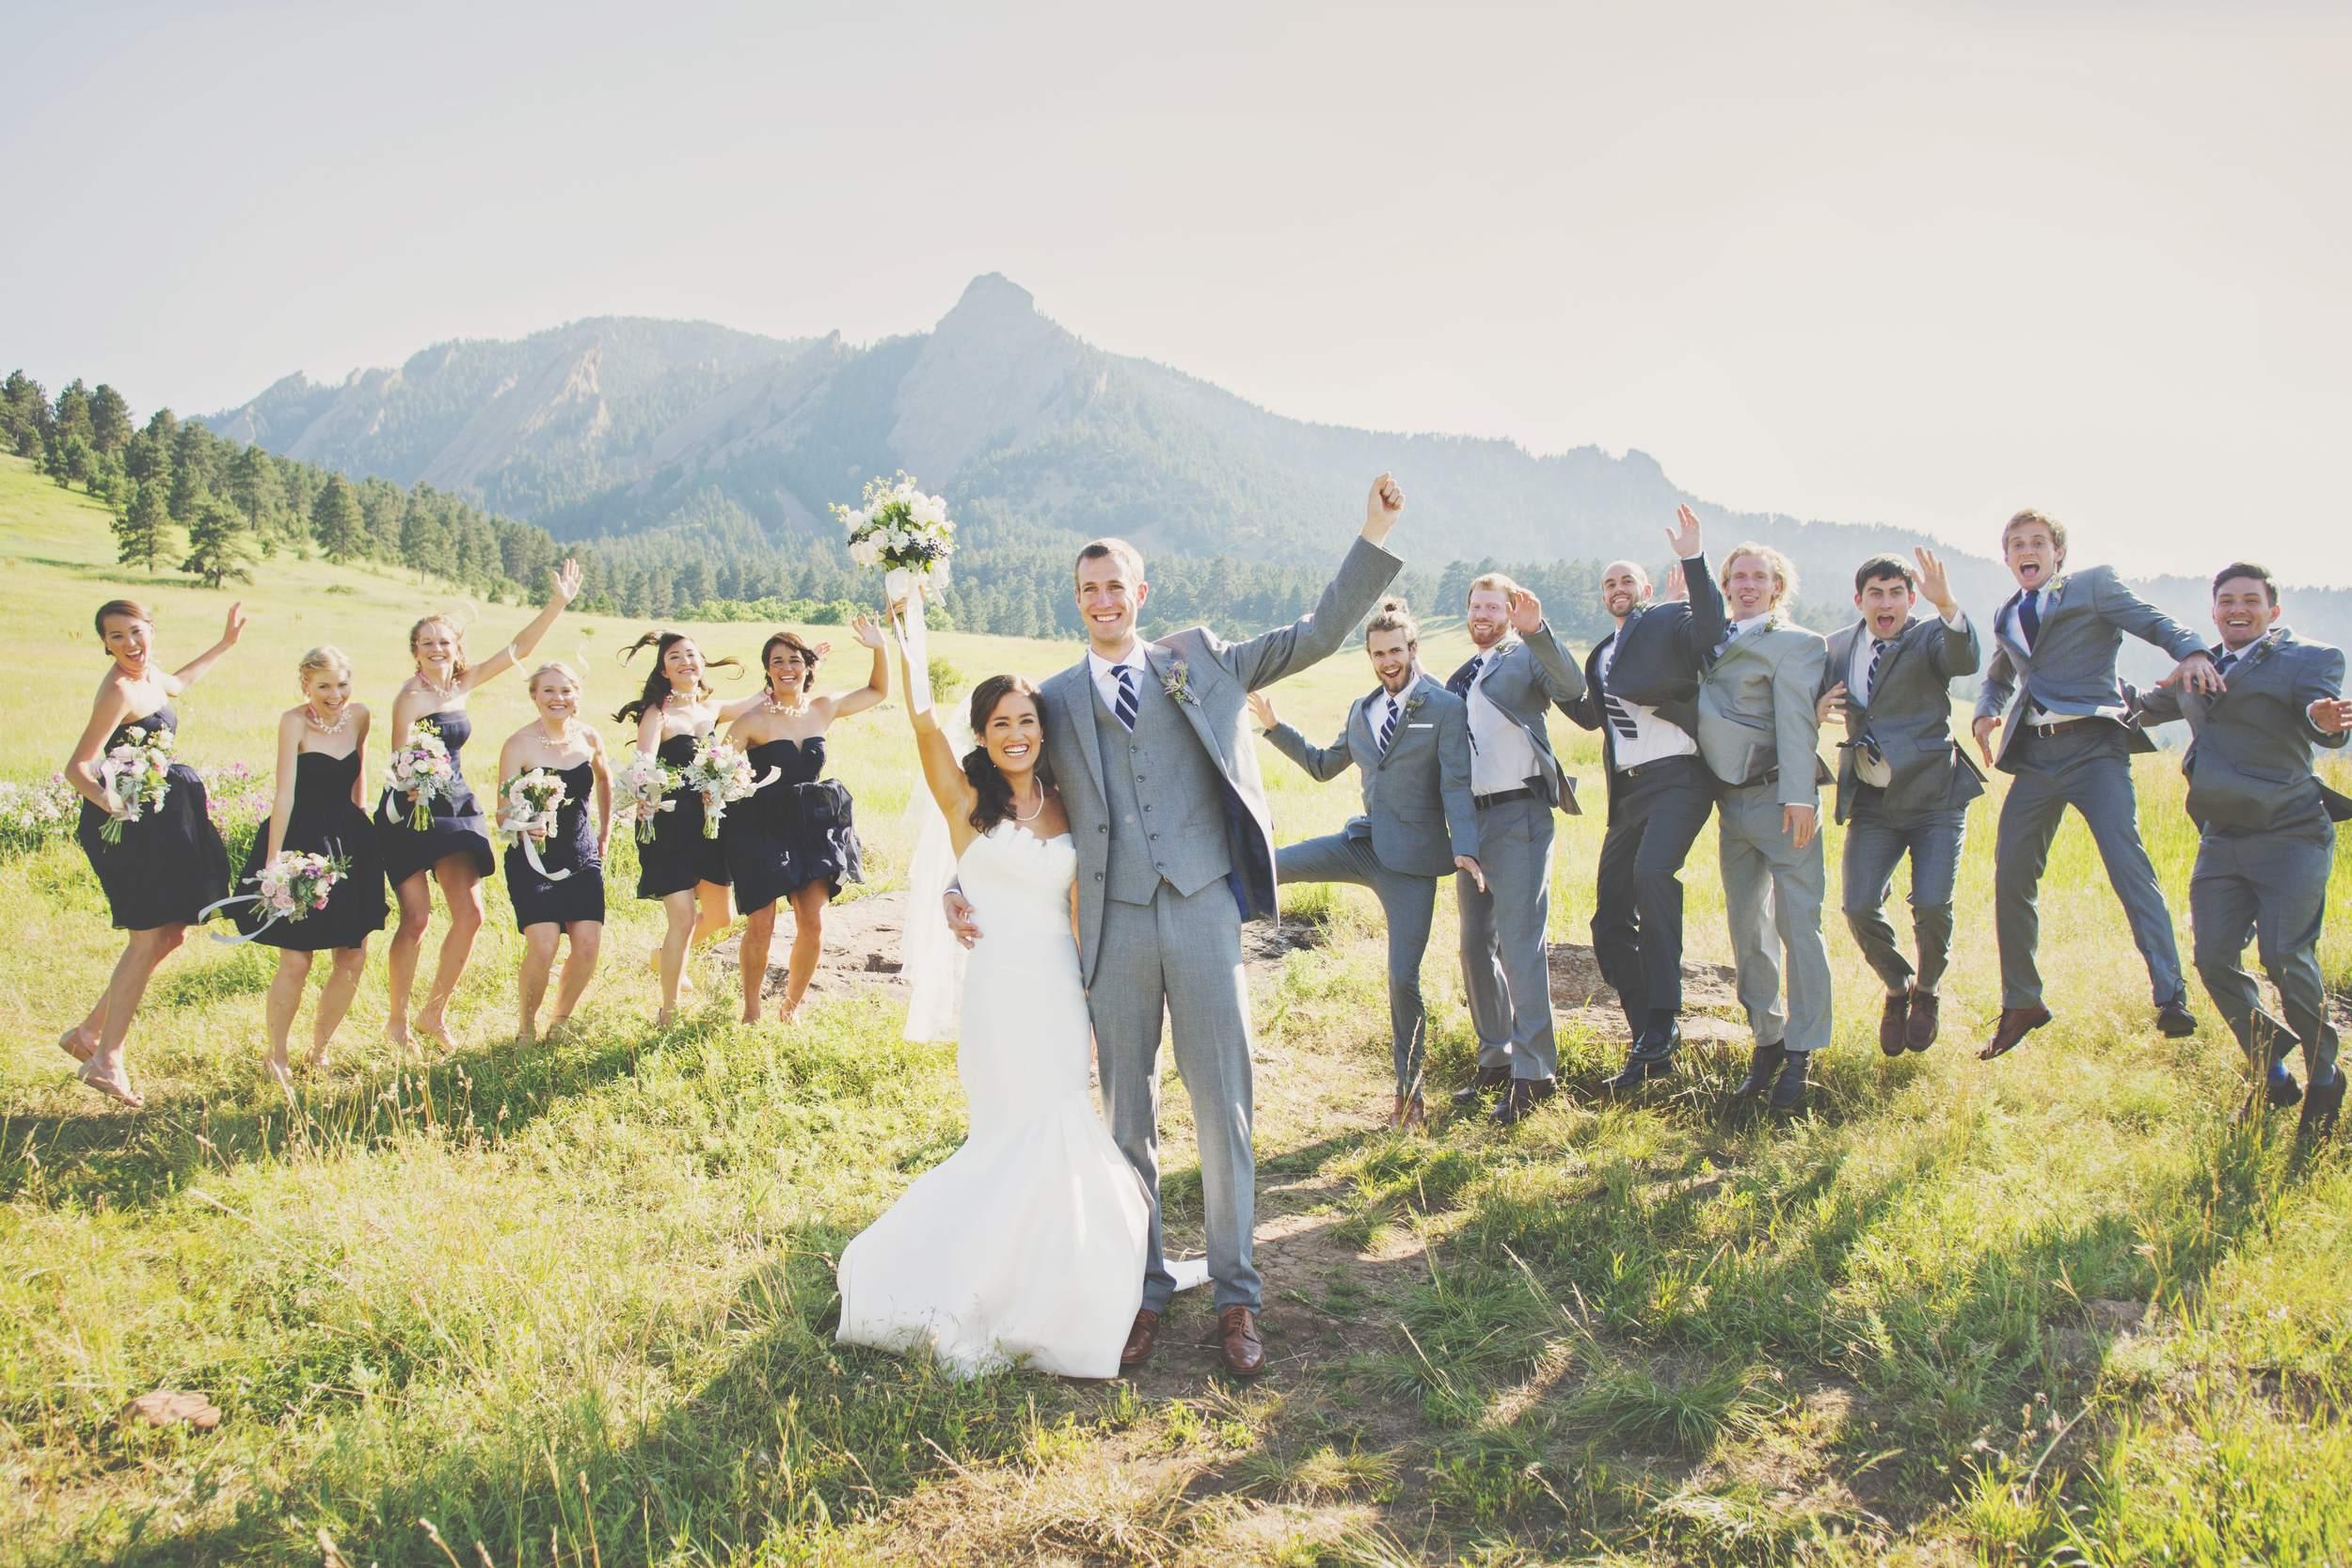 Scoshear Wedding 0379-min.jpg